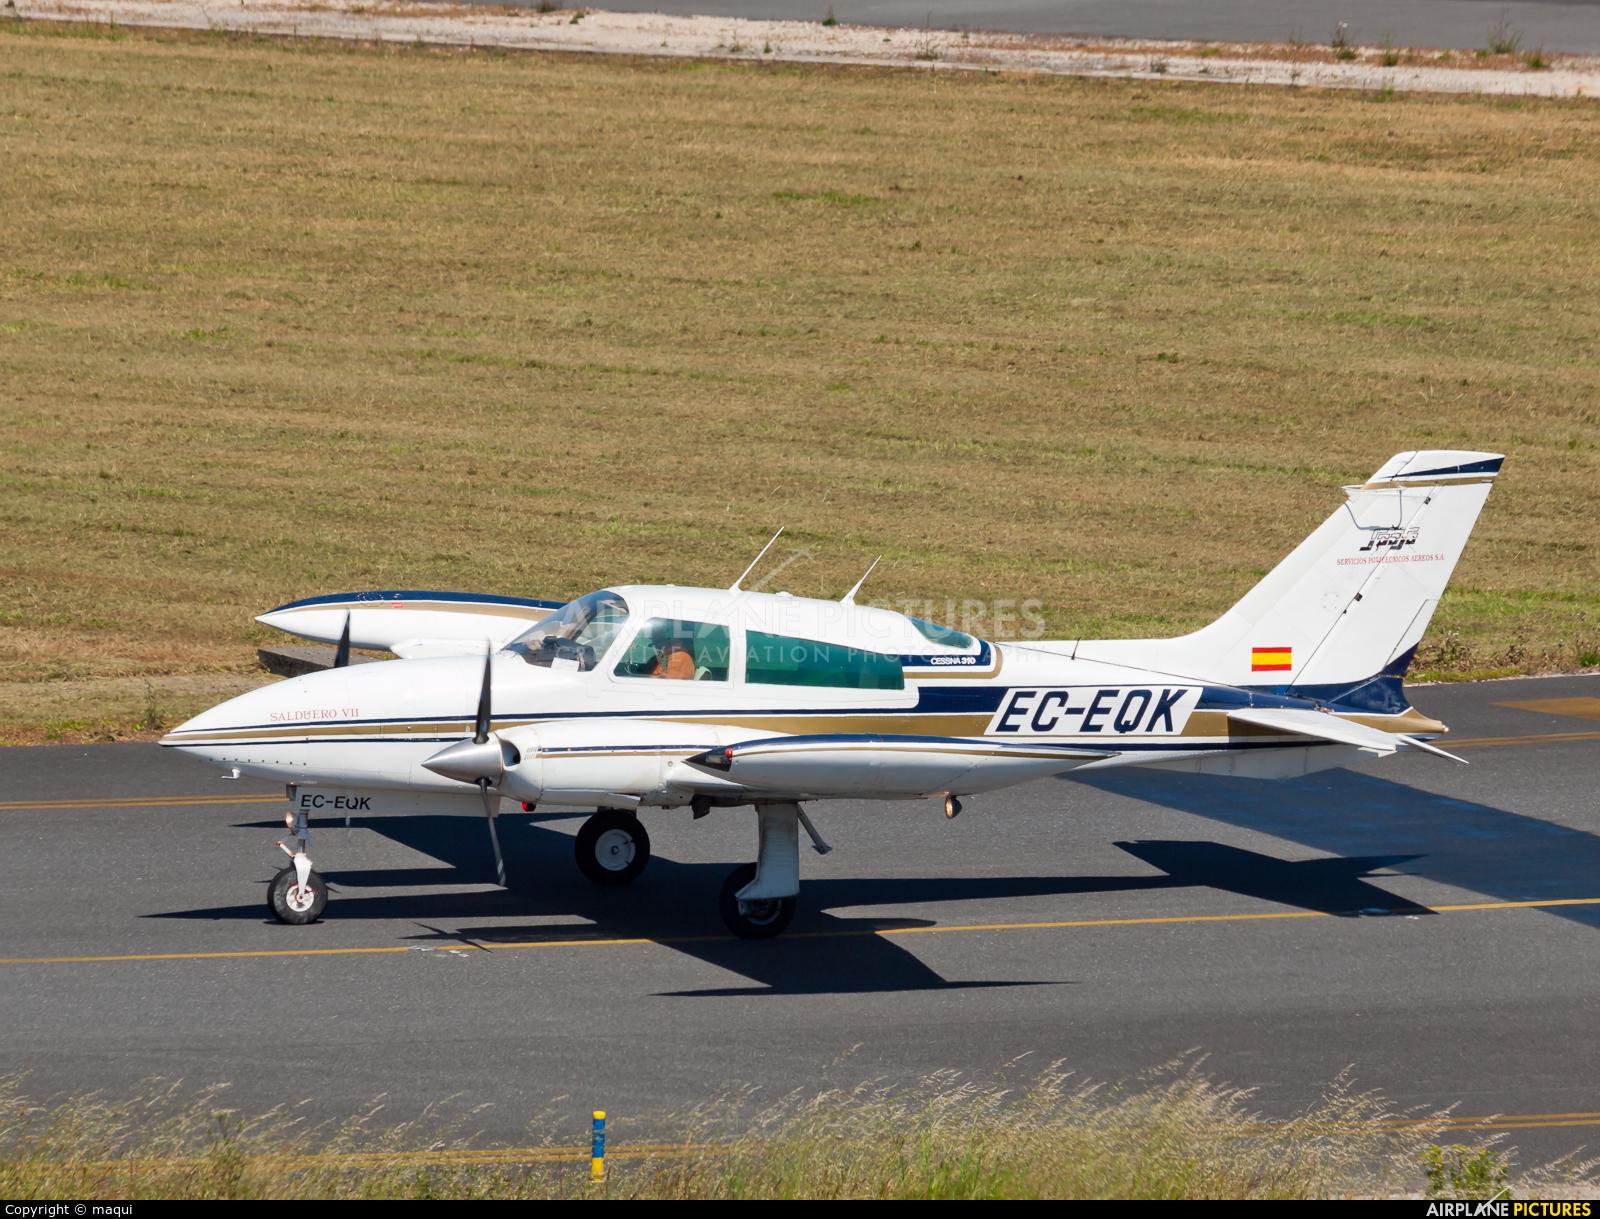 SPASA Servicios Politécnicos Aéreos EC-EQK aircraft at La Coruña